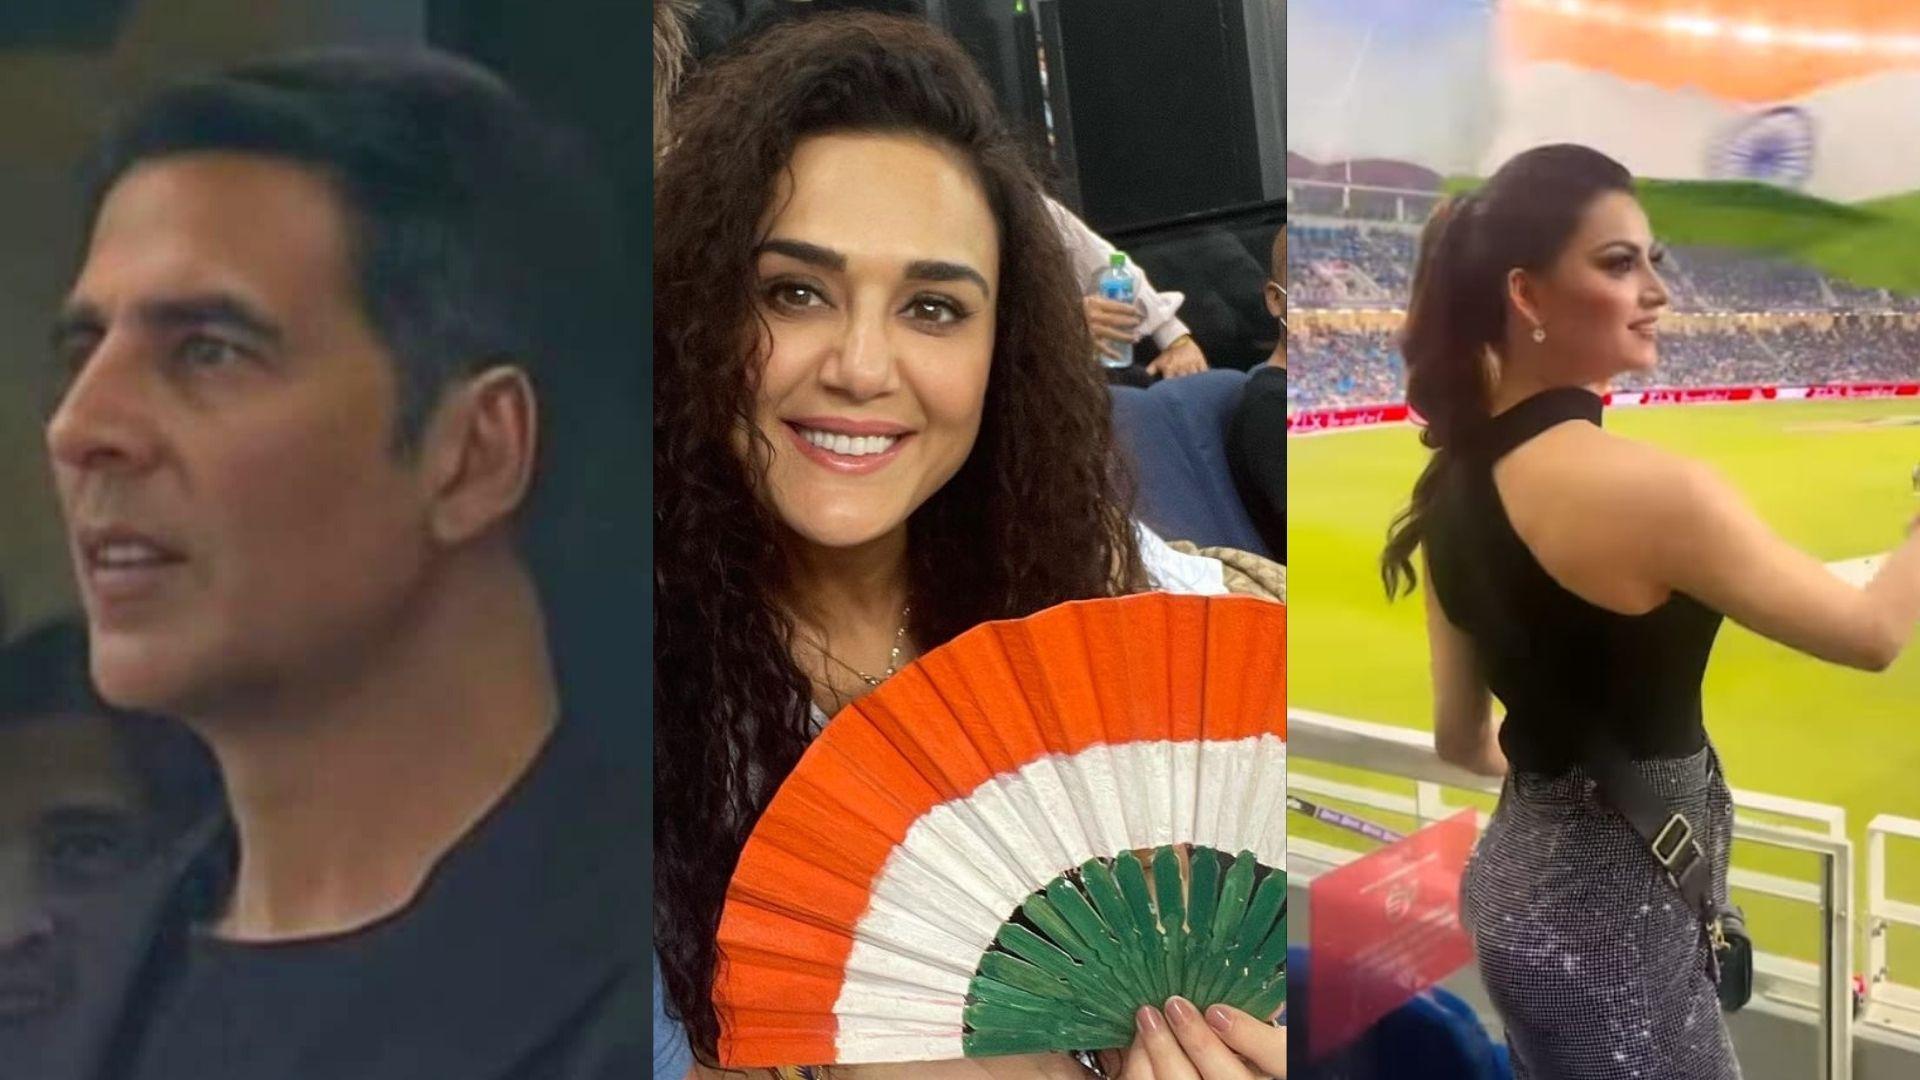 T20 World Cup: Akshay Kumar, Preity Zinta, Urvashi Rautela And Others Attend The India Vs Pakistan Match In Dubai